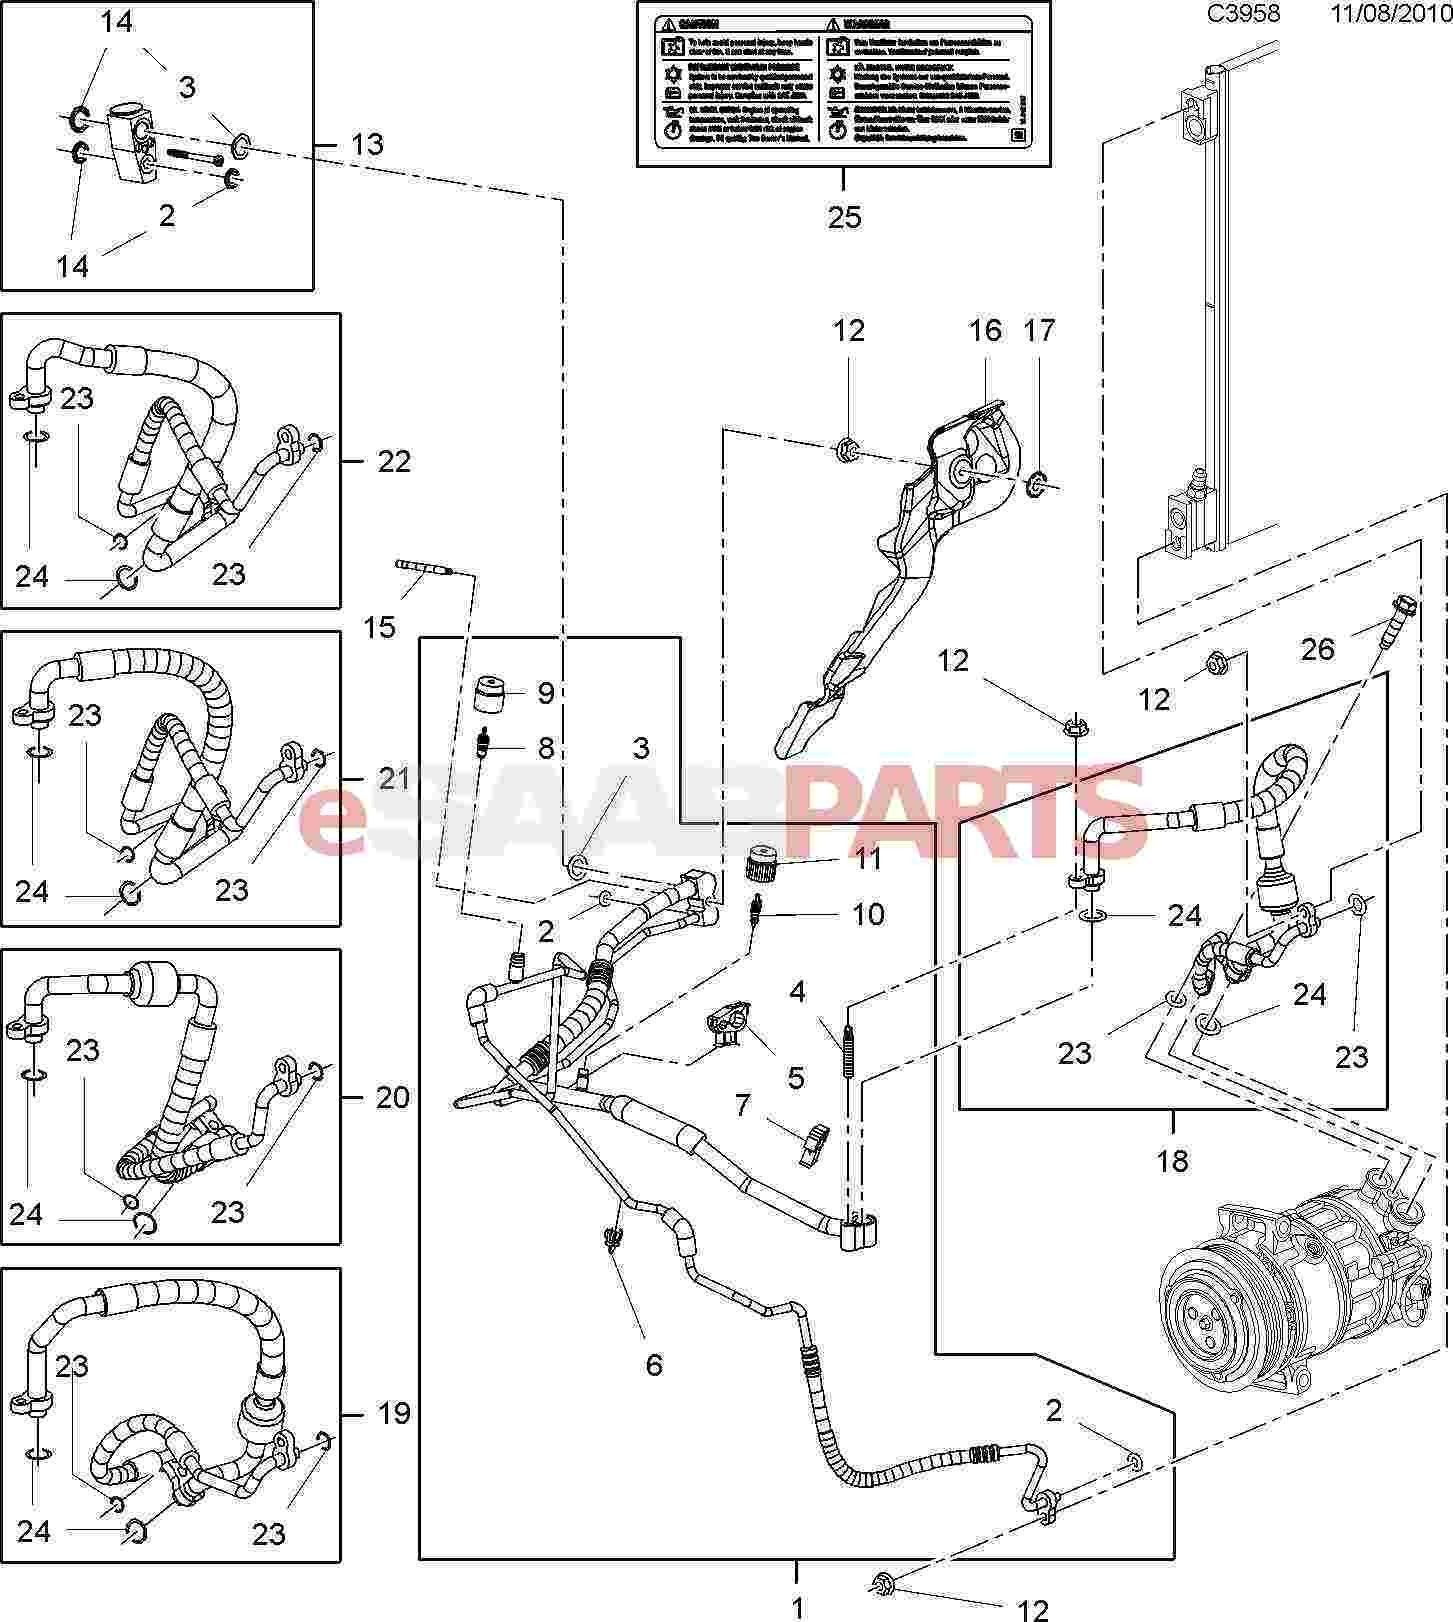 [DIAGRAM] 2007 Vue Wiring Diagram